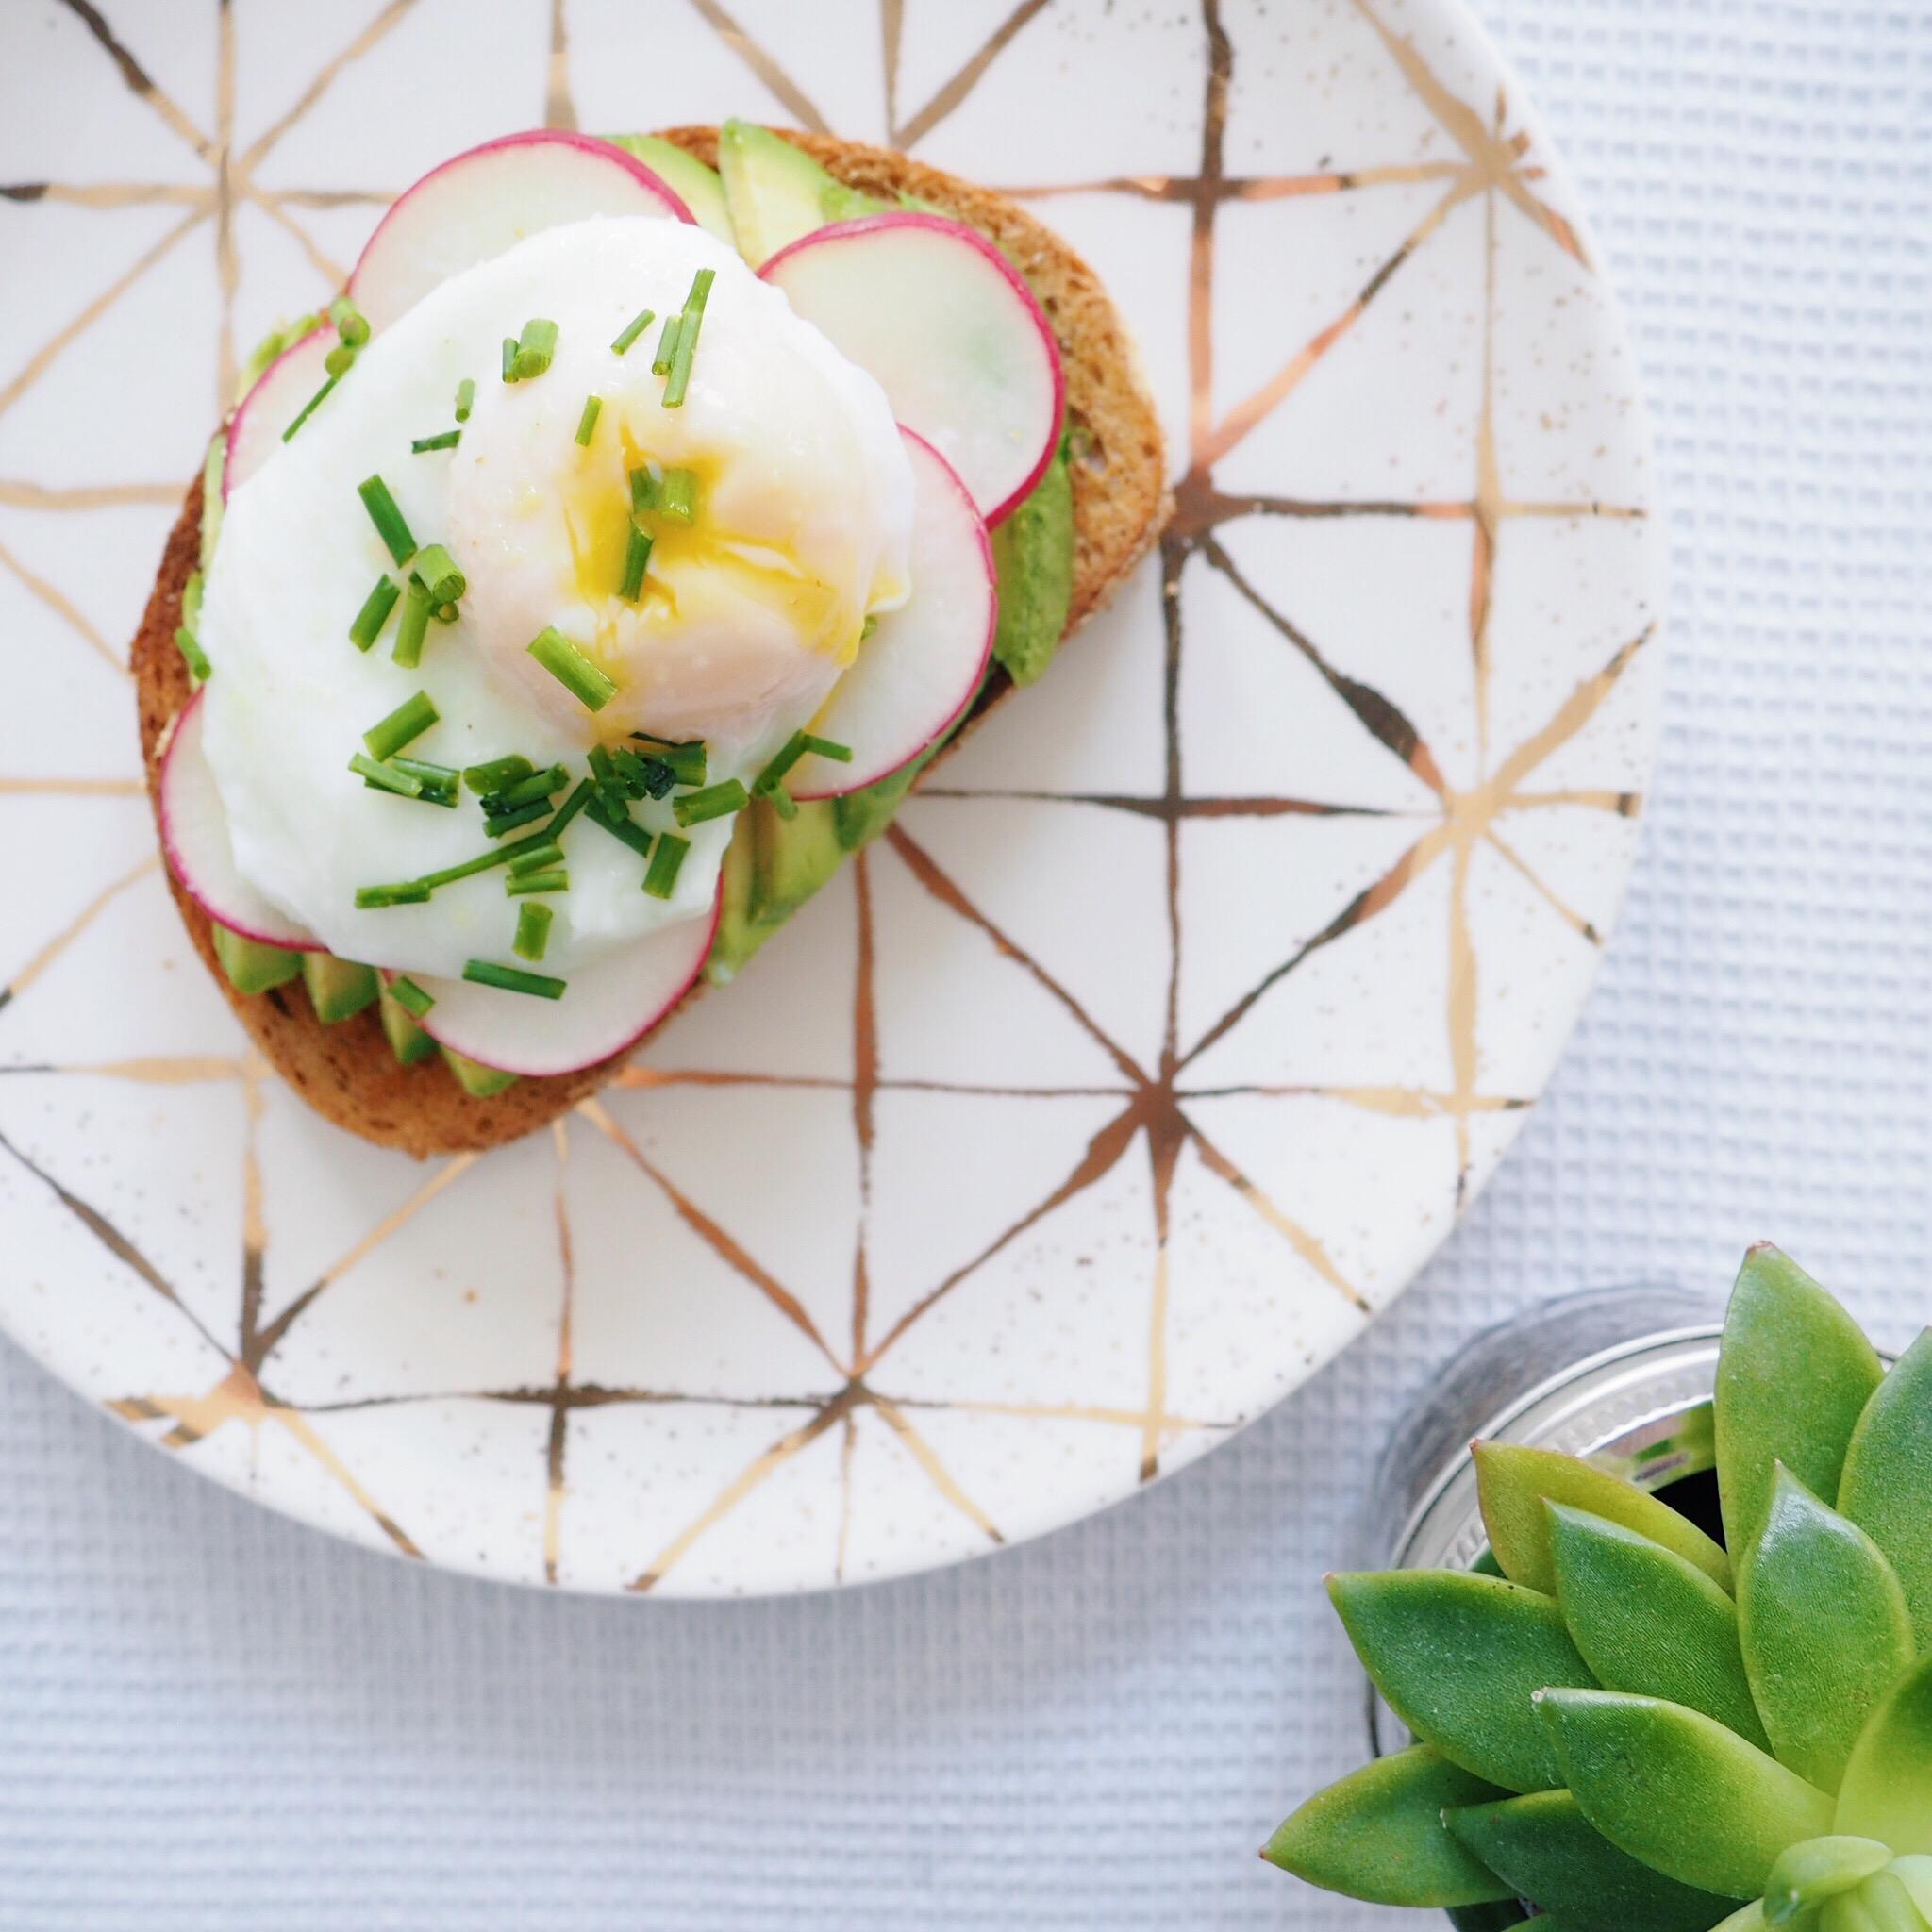 Avo Egg Toast with Radish(1).JPG